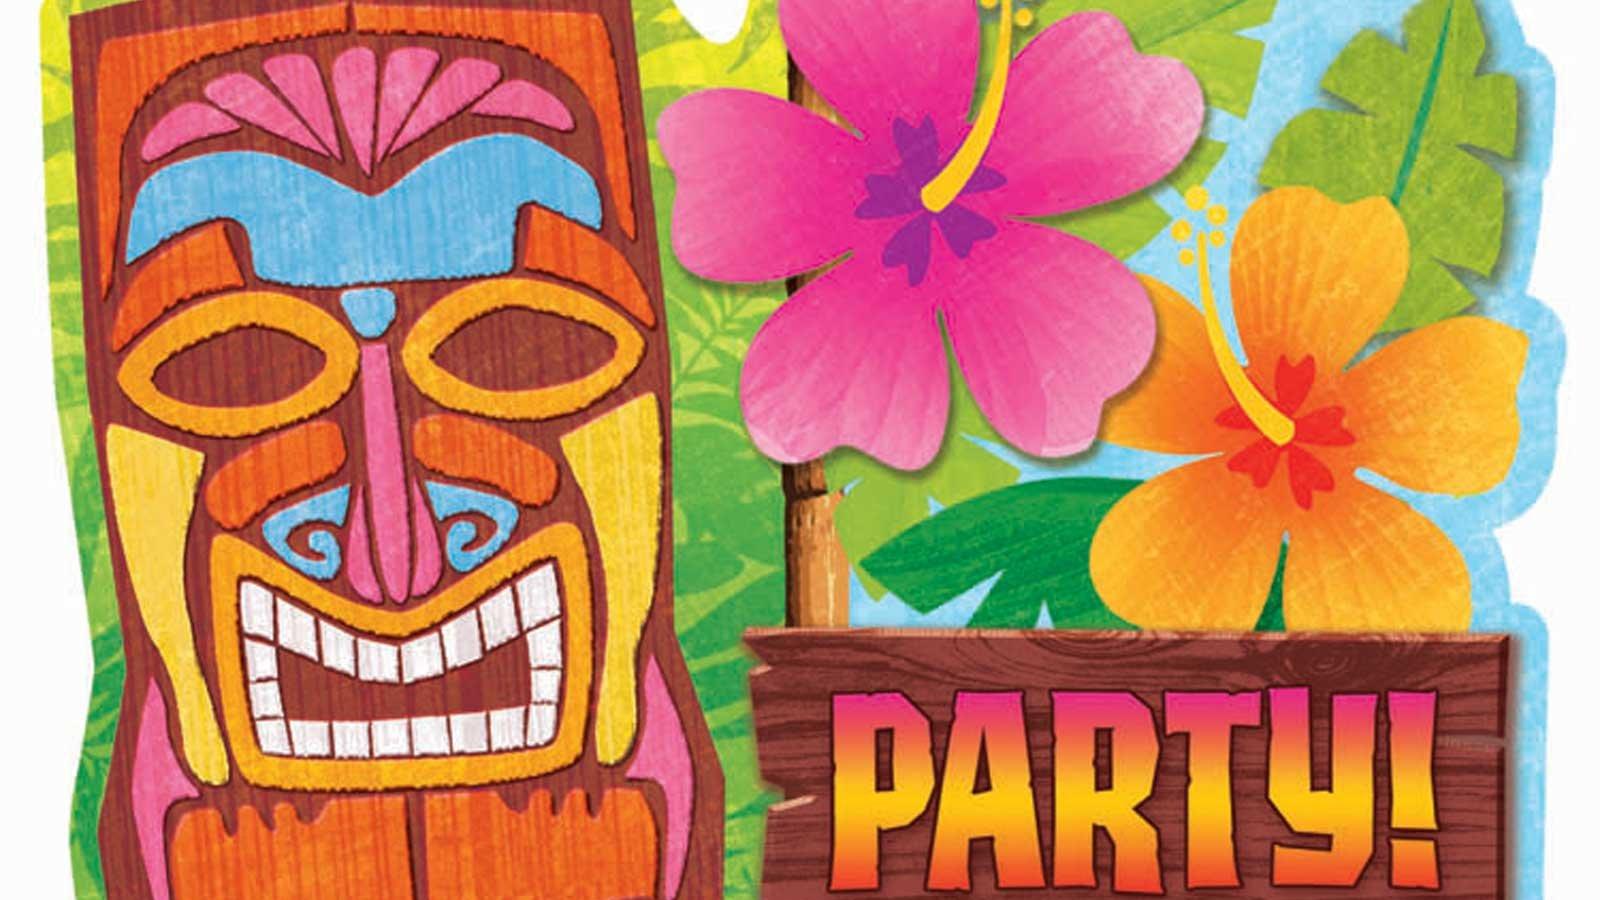 It's just an image of Free Printable Luau Invitations regarding downloadable luau invitation